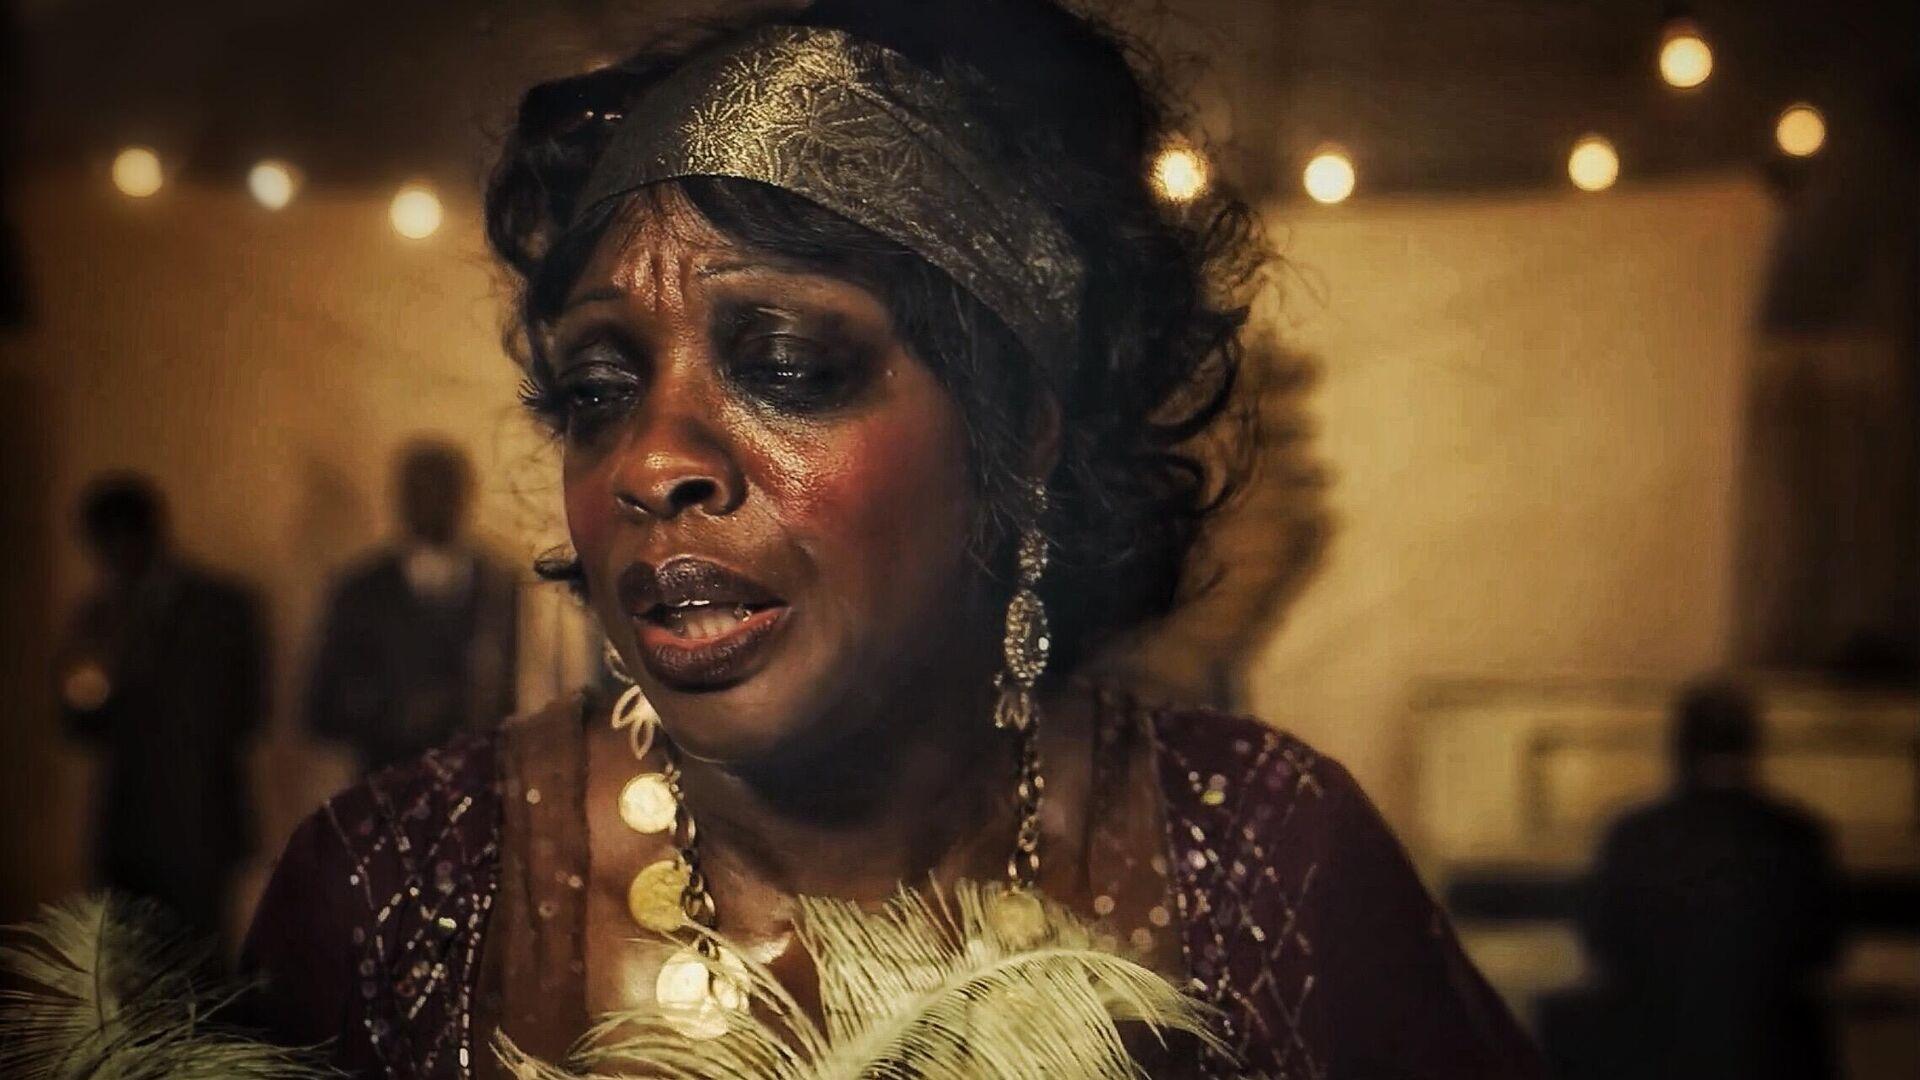 Viola Davis caracterizada de Ma Rainey - Sputnik Mundo, 1920, 30.04.2021